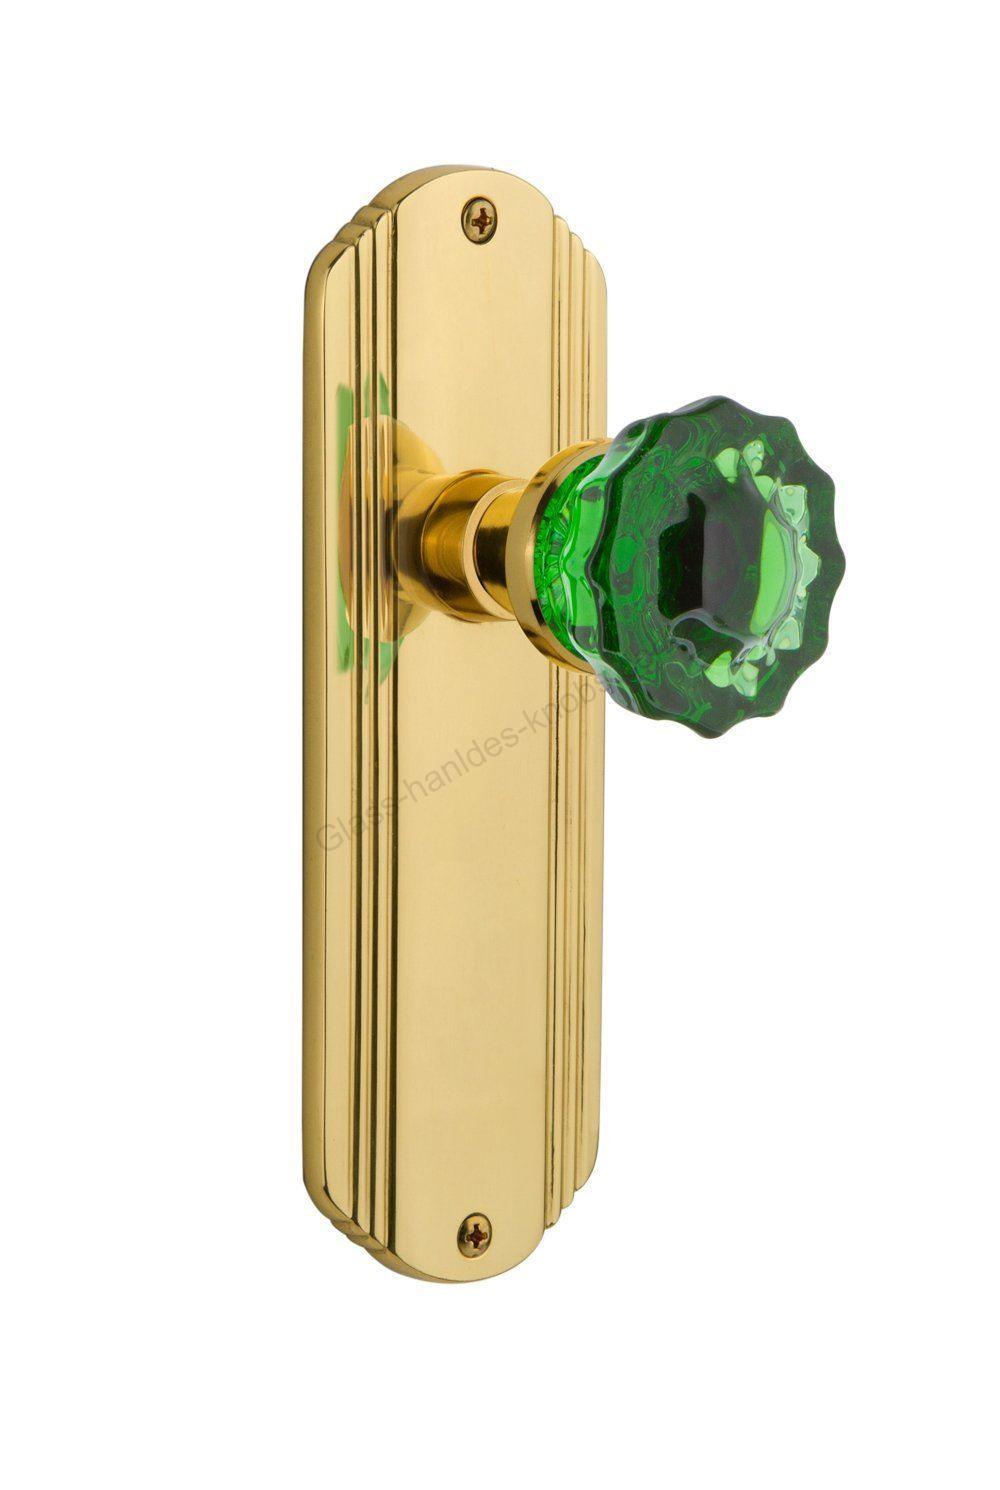 glass privacy door knobs photo - 13